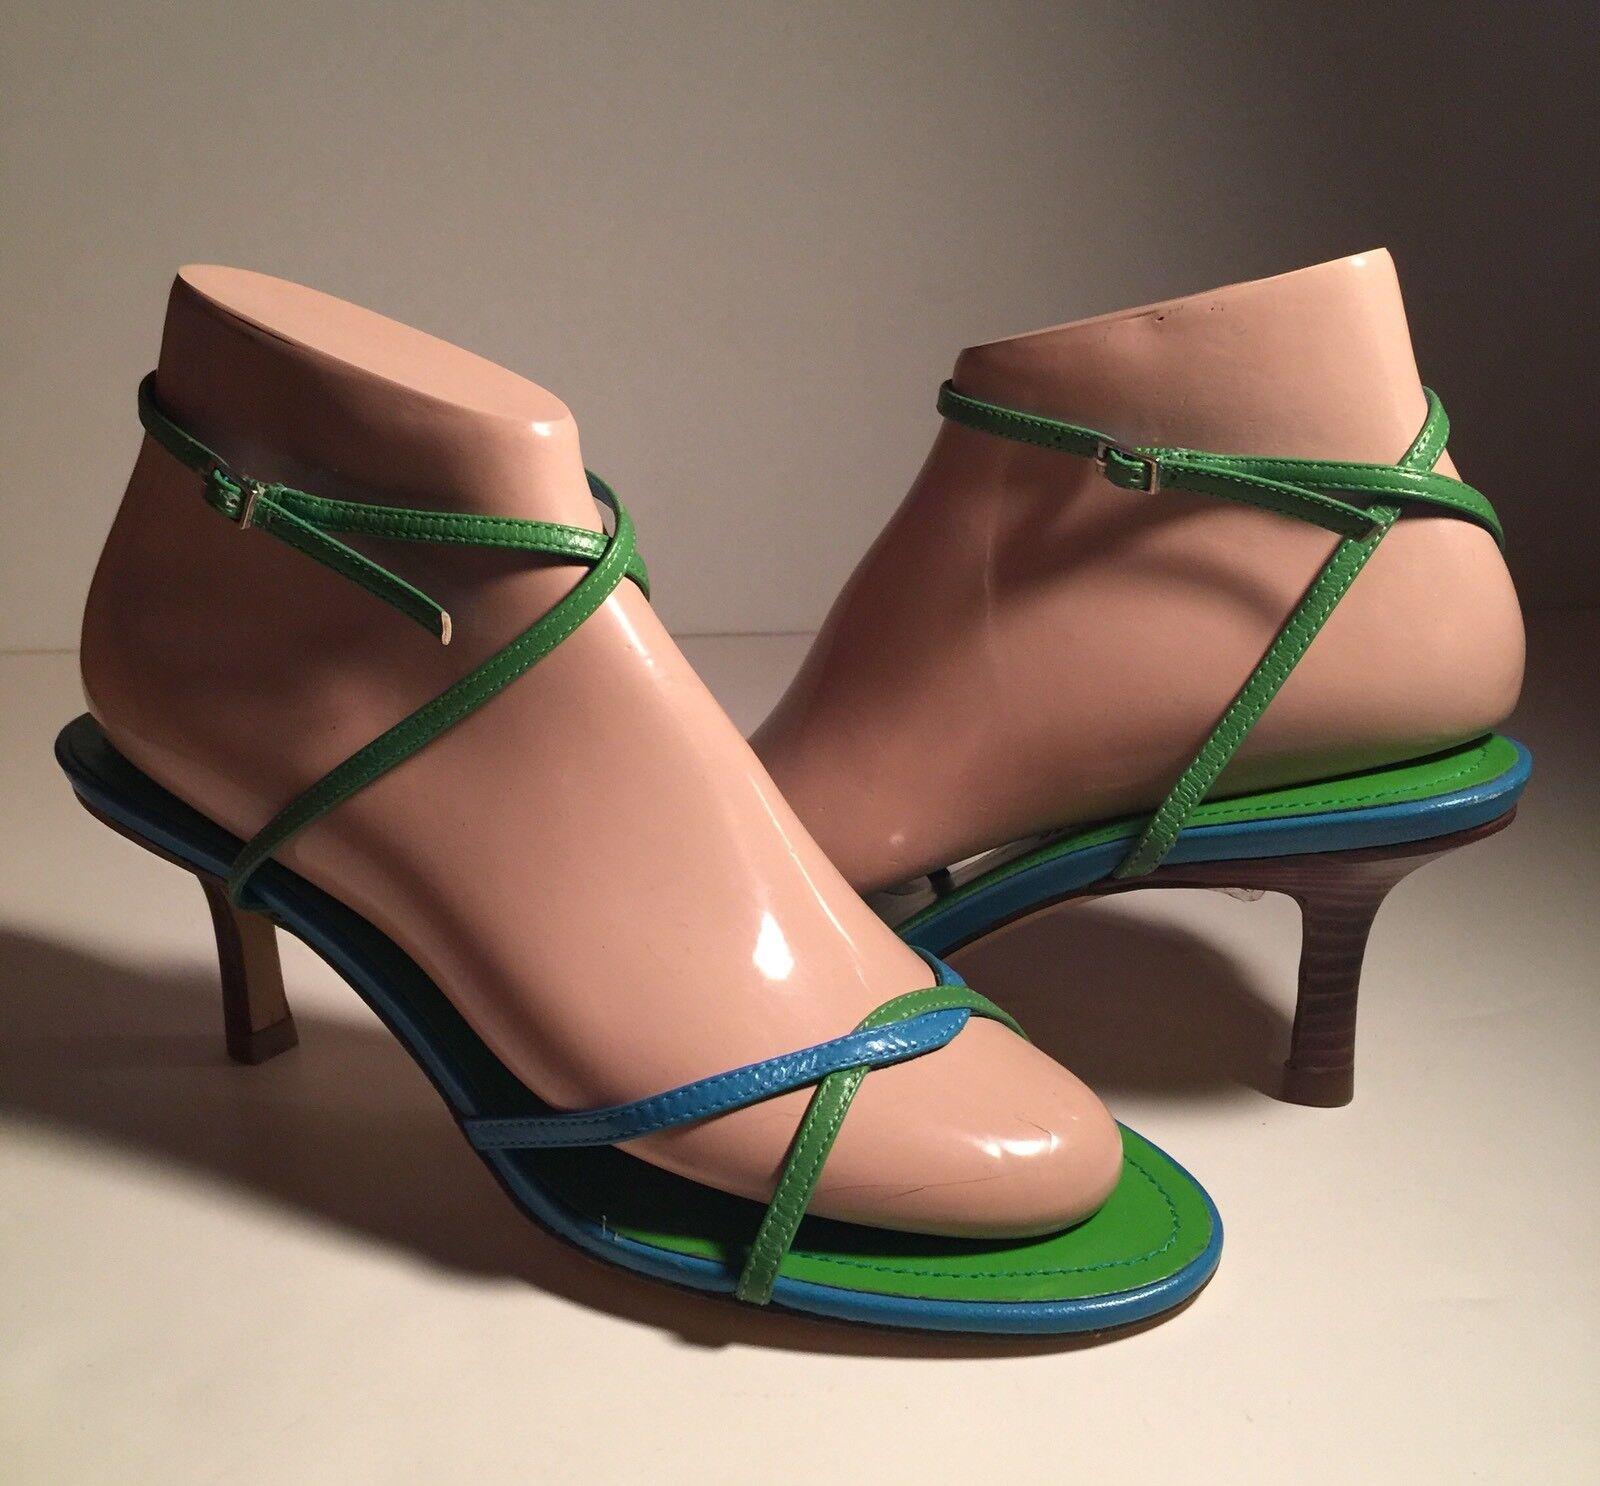 "Vtg Tommy Hilfiger Strappy Women Strappy Hilfiger Sandal Ankle Strap Green Blue 3""heel  Sz 7M New 21ea88"